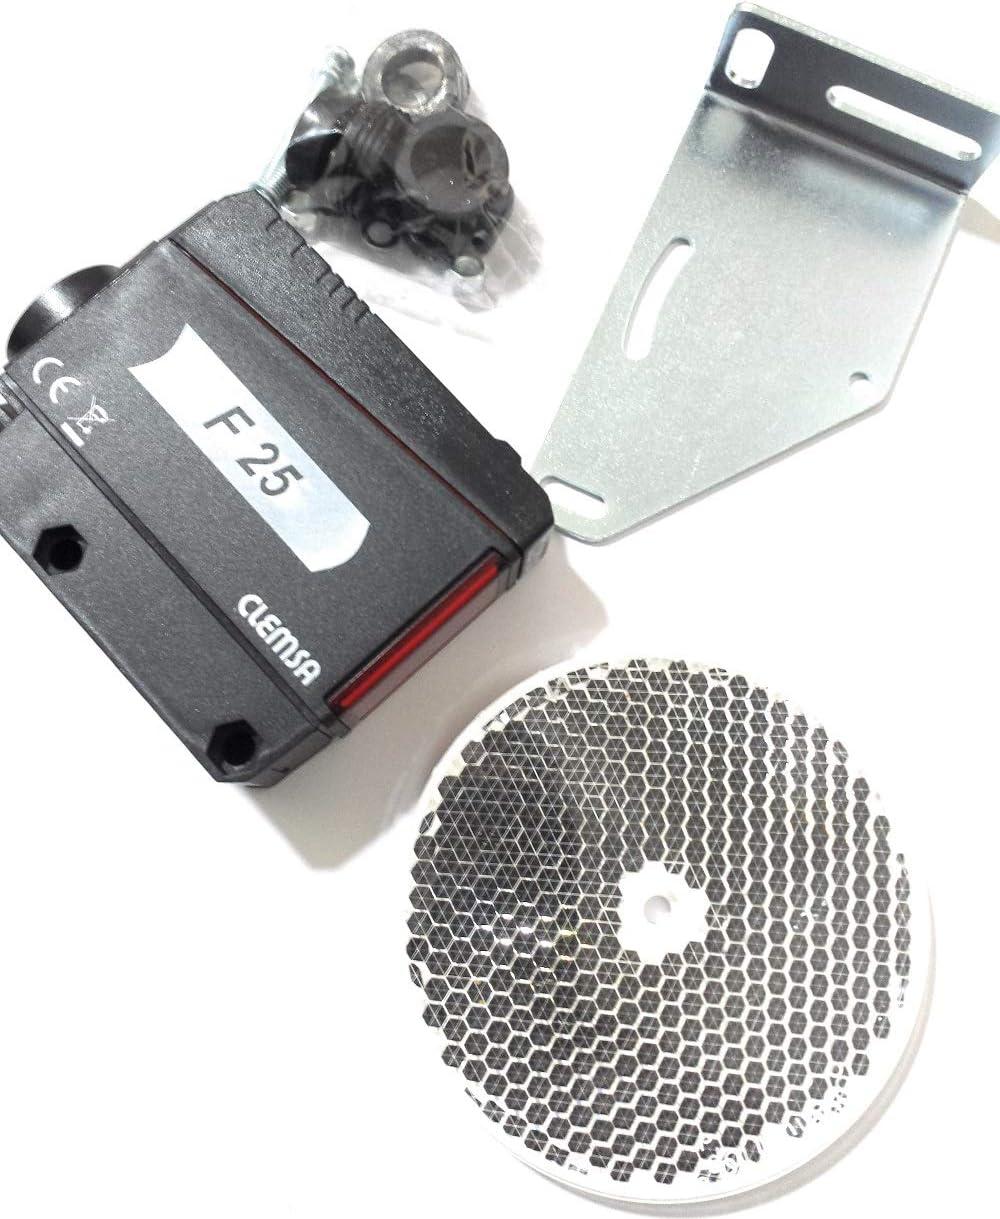 JFE SP fotocélula infrarroja exterior reflexiva de la fotocélula de Motorline Professional/Universal para cualquier tipo de puertas de garaje !!!